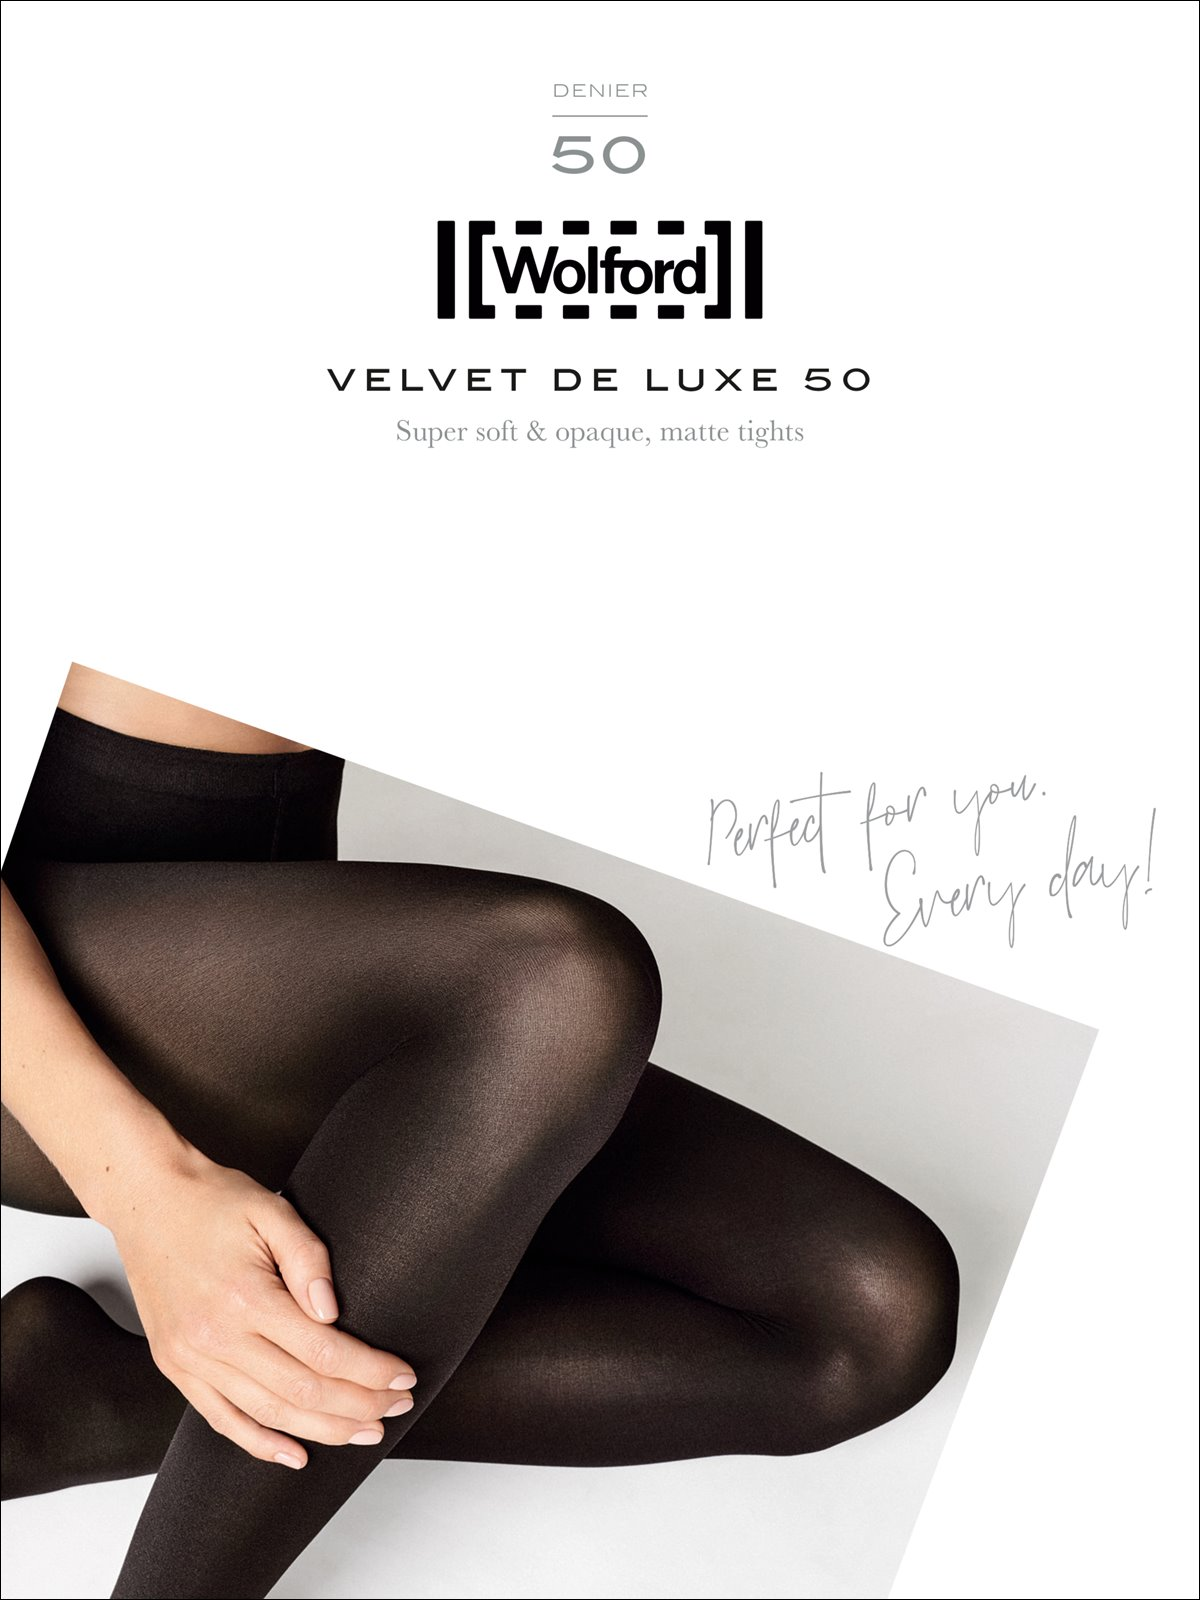 Wolford Velvet de Luxe 50 Tights blickdichte Strumpfhose 50 DEN